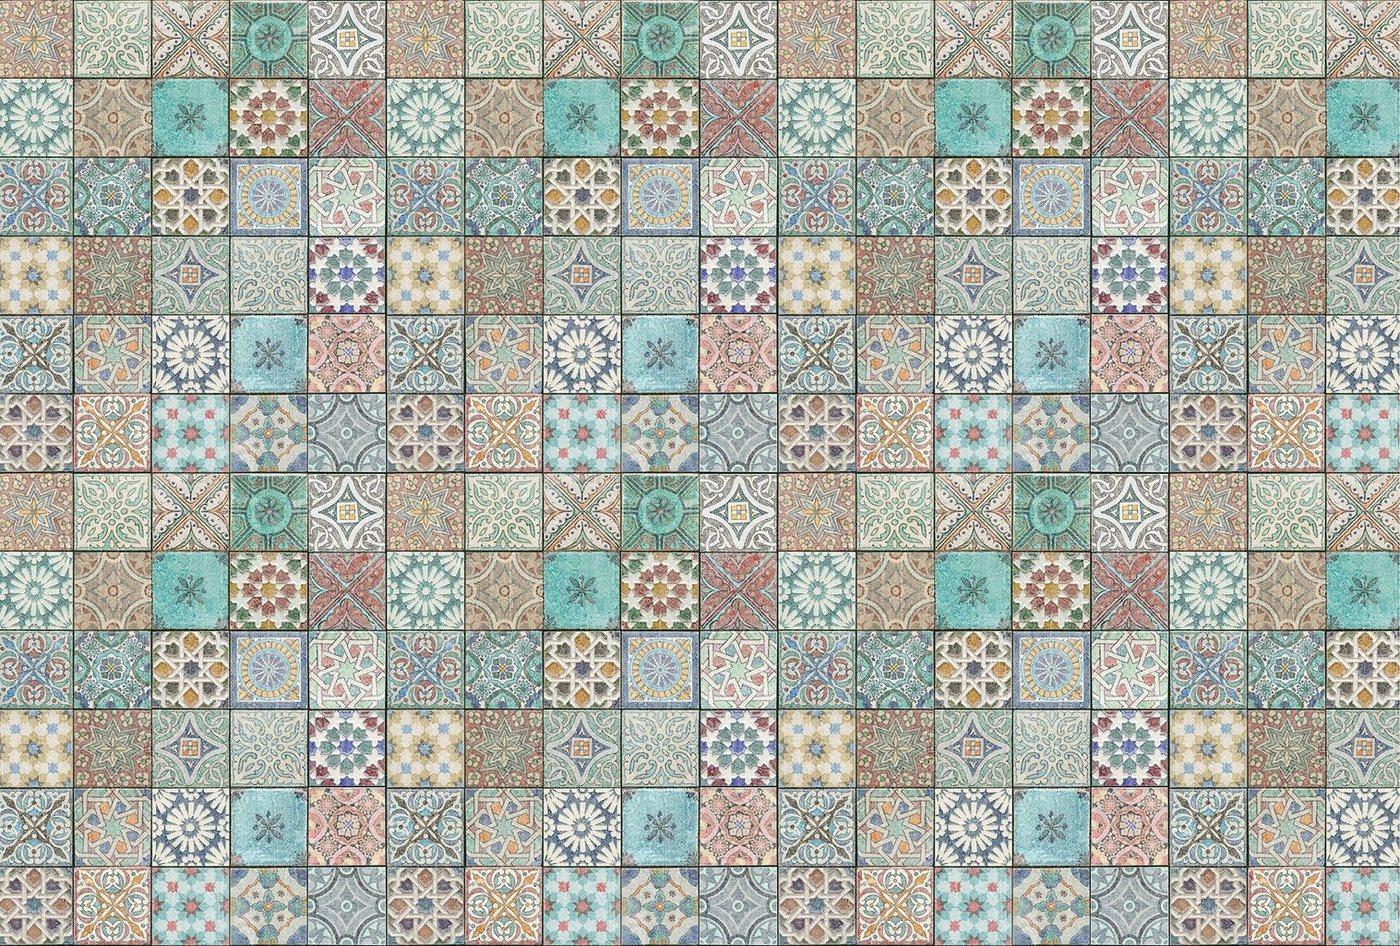 Architects Paper Fototapete »Tiles Oriental«, (Set, 4 St), mediterrane Fliesen, Vlies, glatt